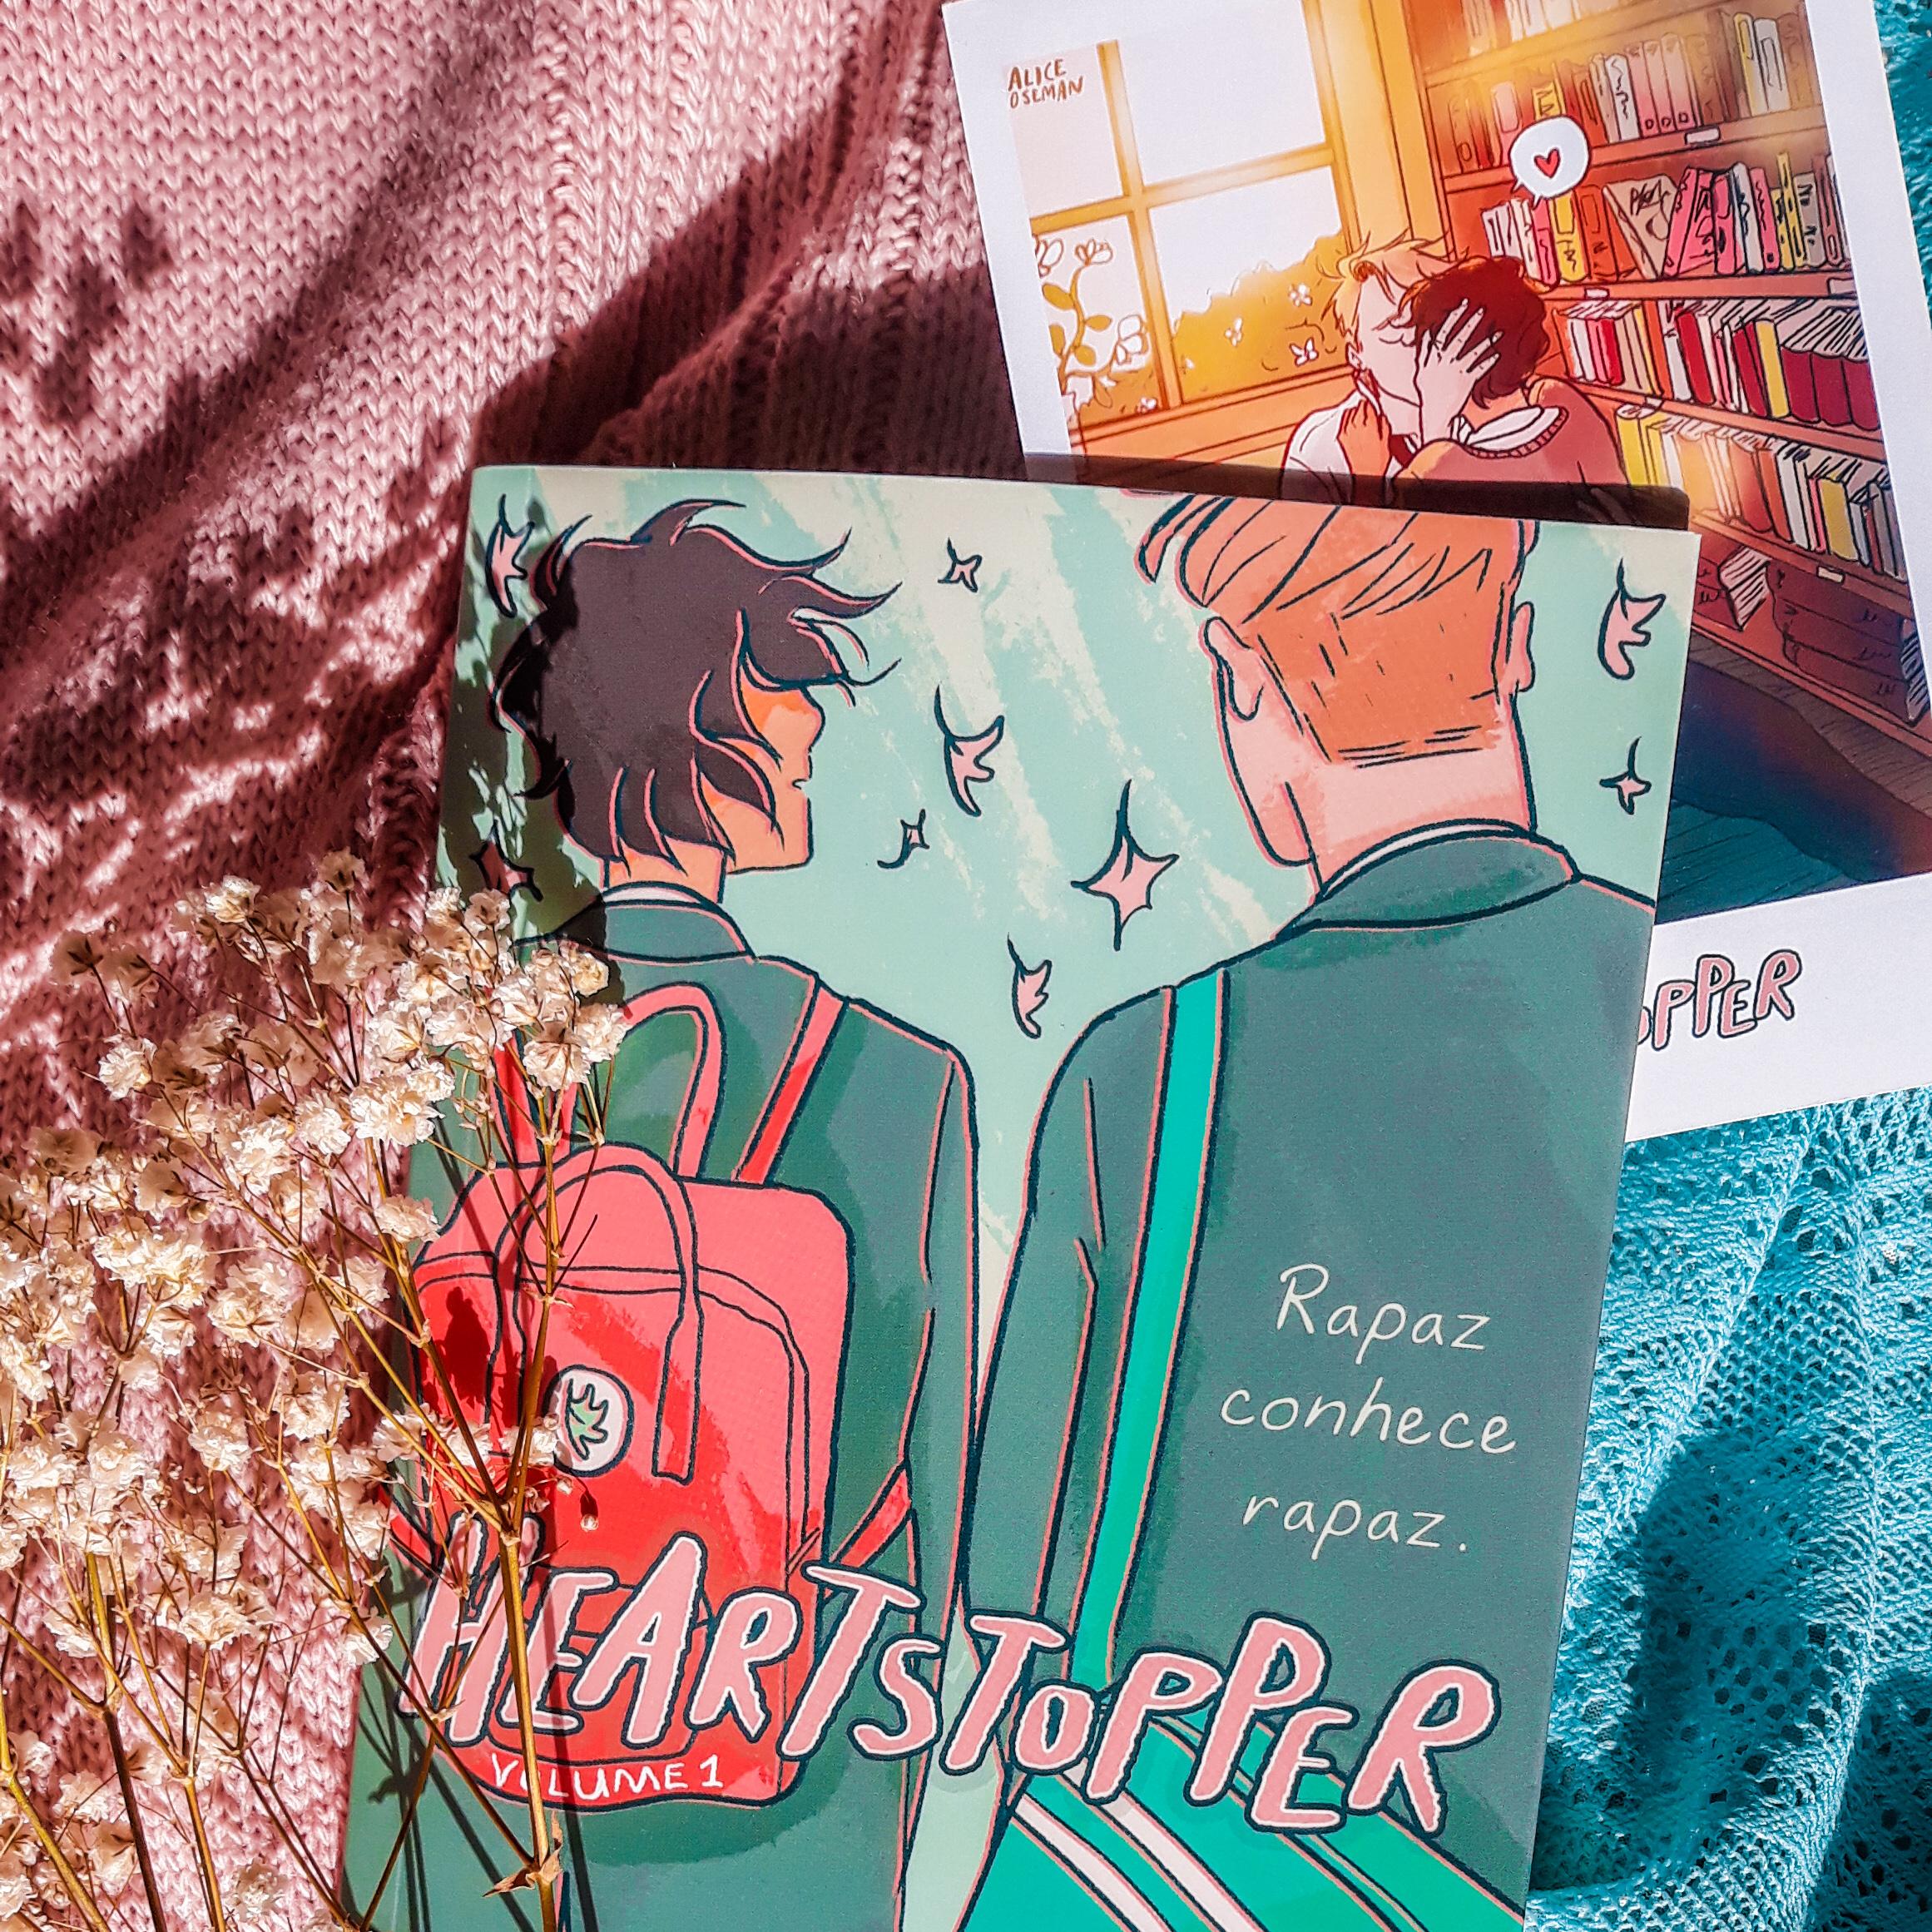 Livro Heartstopper da Alice Oseman